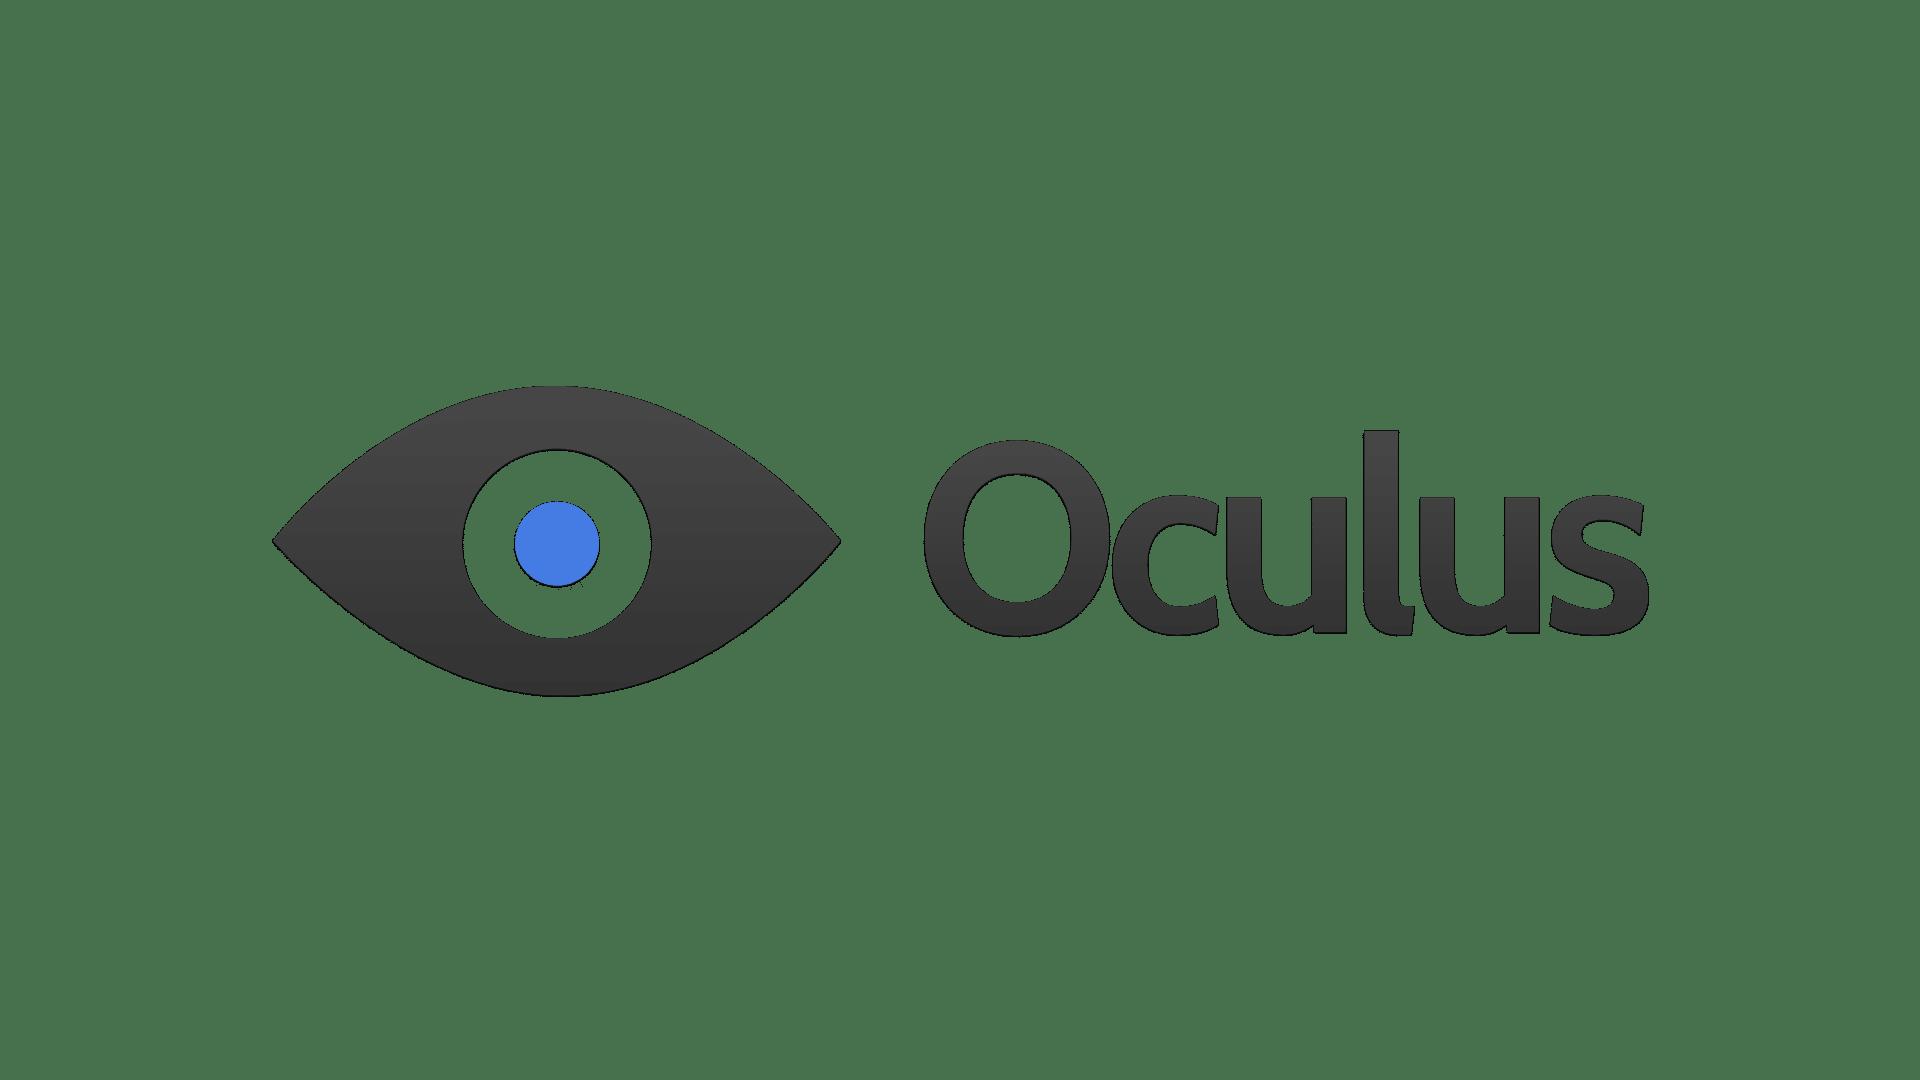 Oculus rift, virtual reality leaders